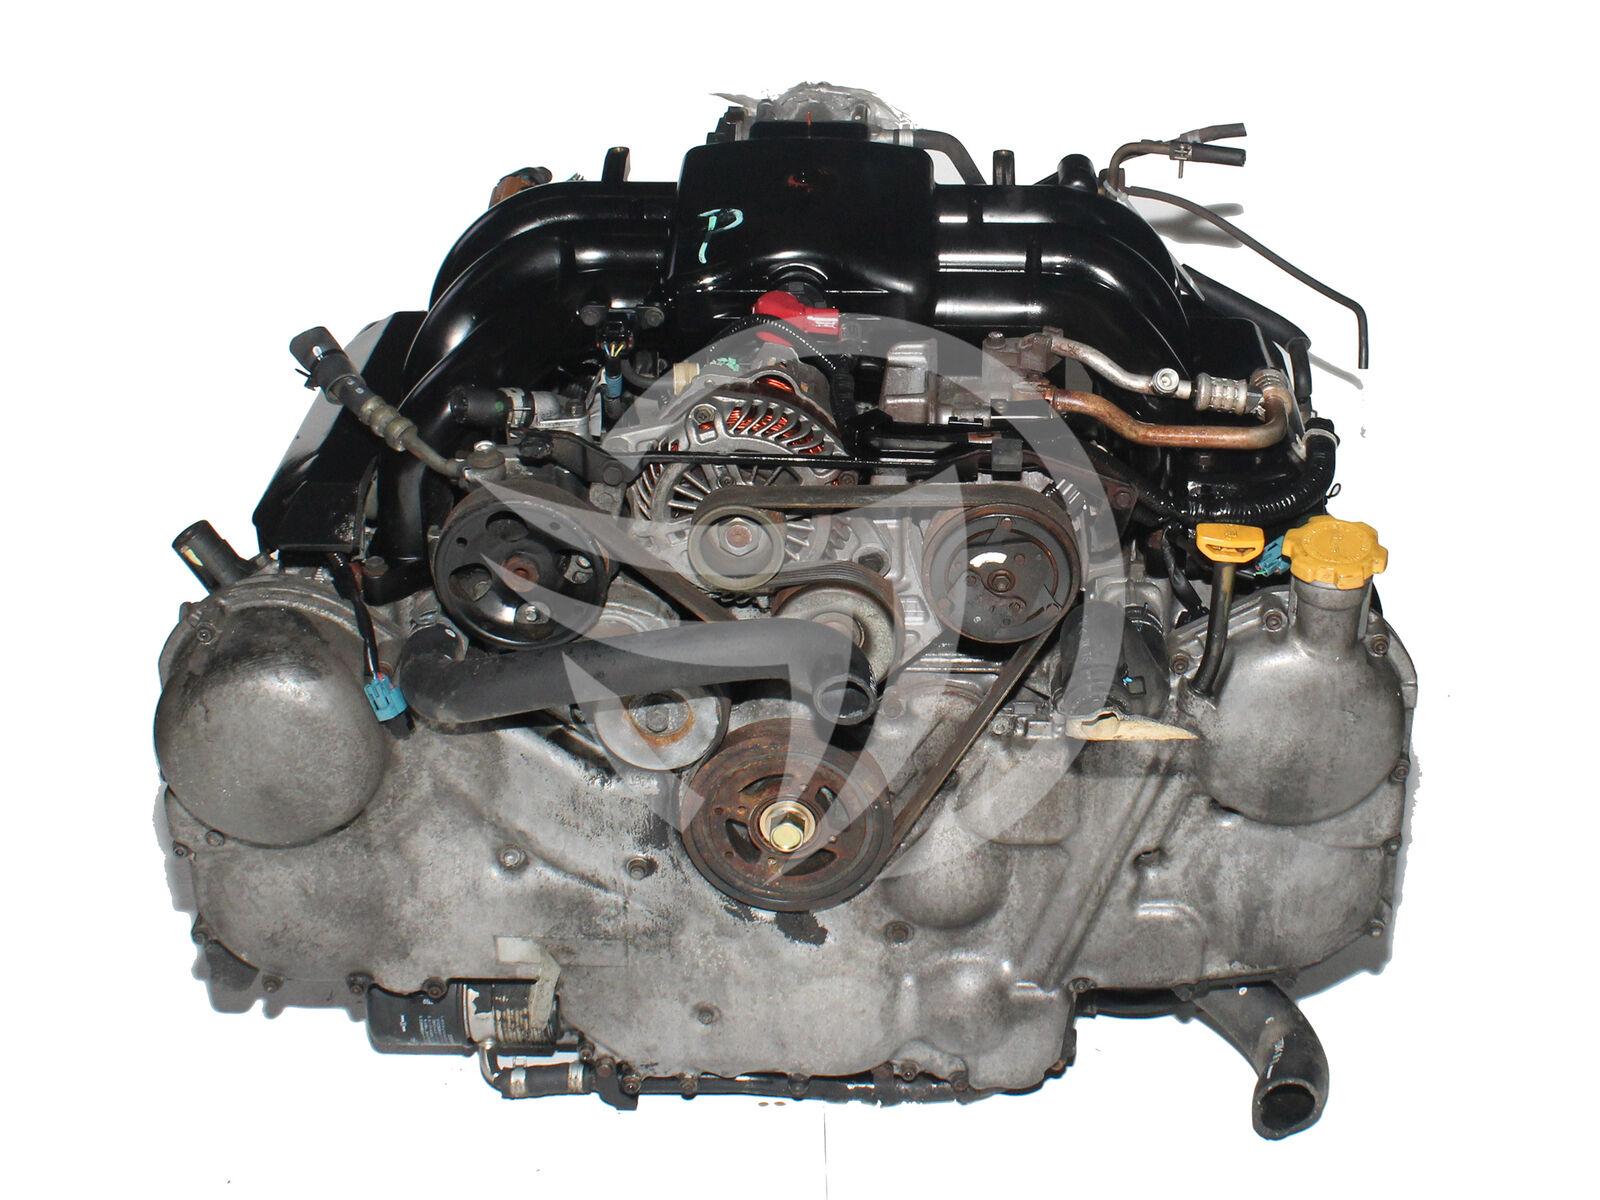 05-09 SUBARU OUTBACK 3 0R 6 CYLINDER ENGINE JDM EZ30D